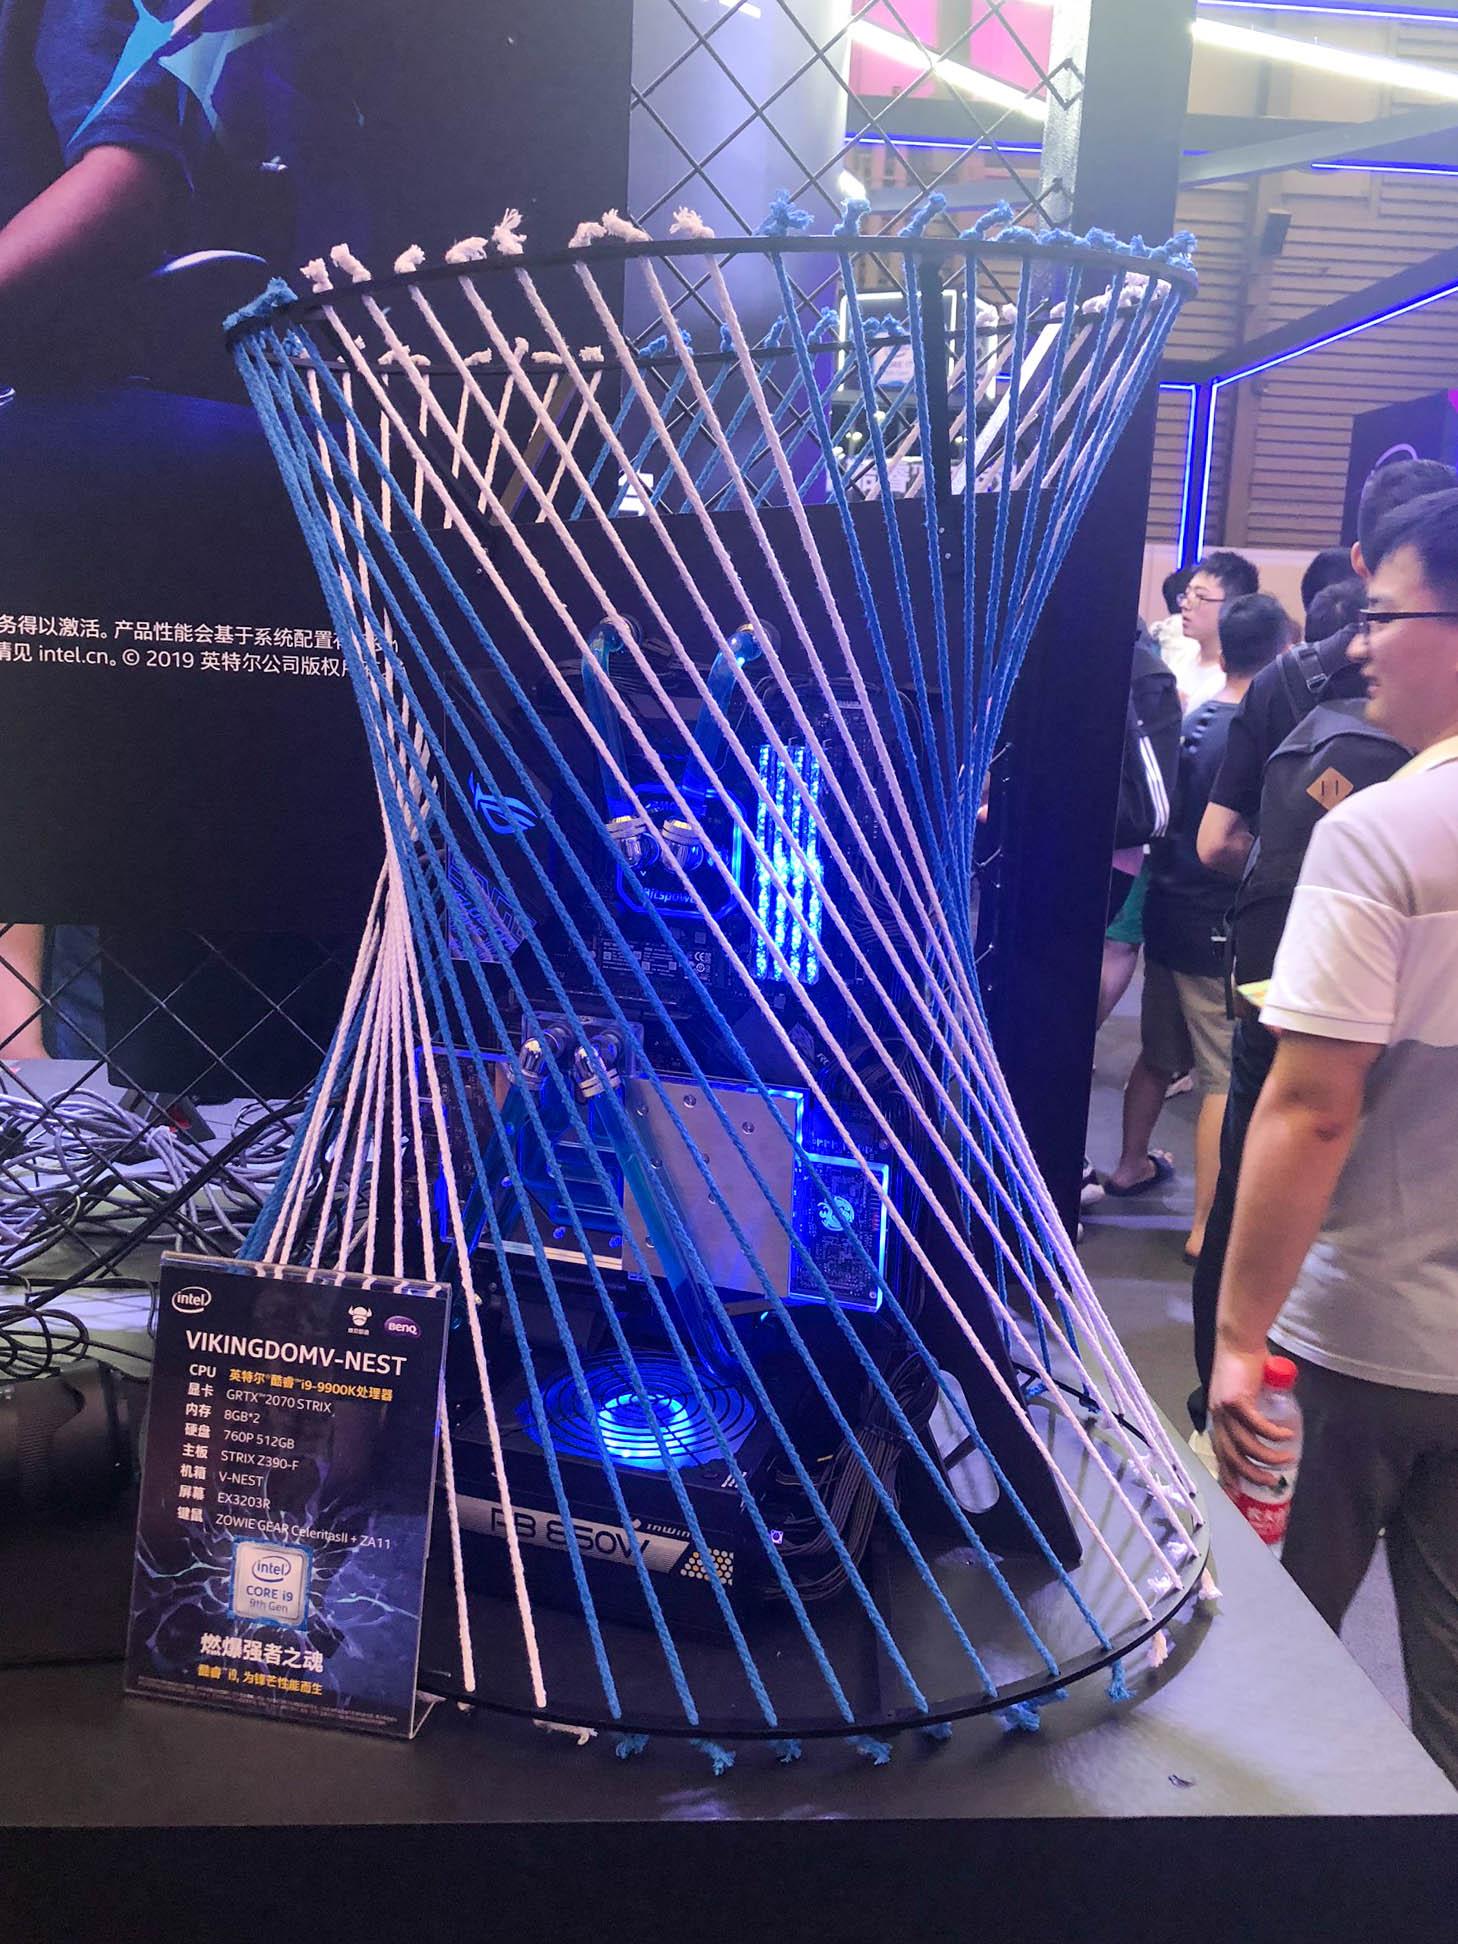 2019 ChinaJoy 中国国际数码互动娱乐展览会 游玩 第14张